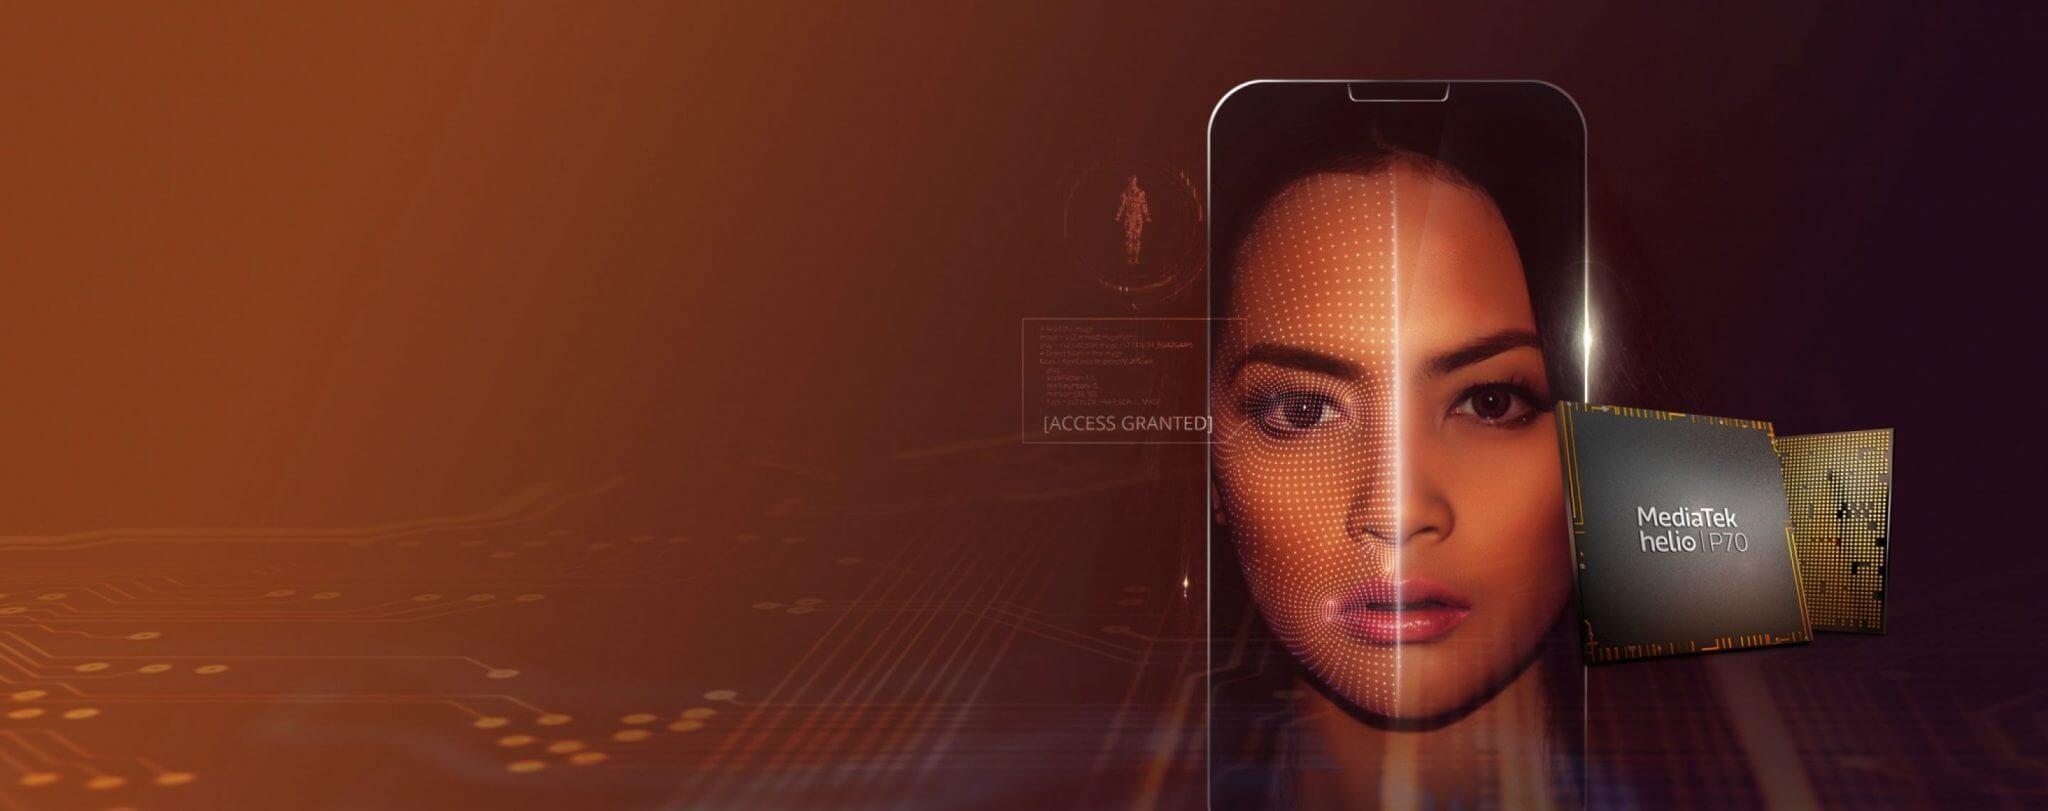 Neue KI für Midrange-Smartphones:  MediaTek Helio P70 angekündigt 3